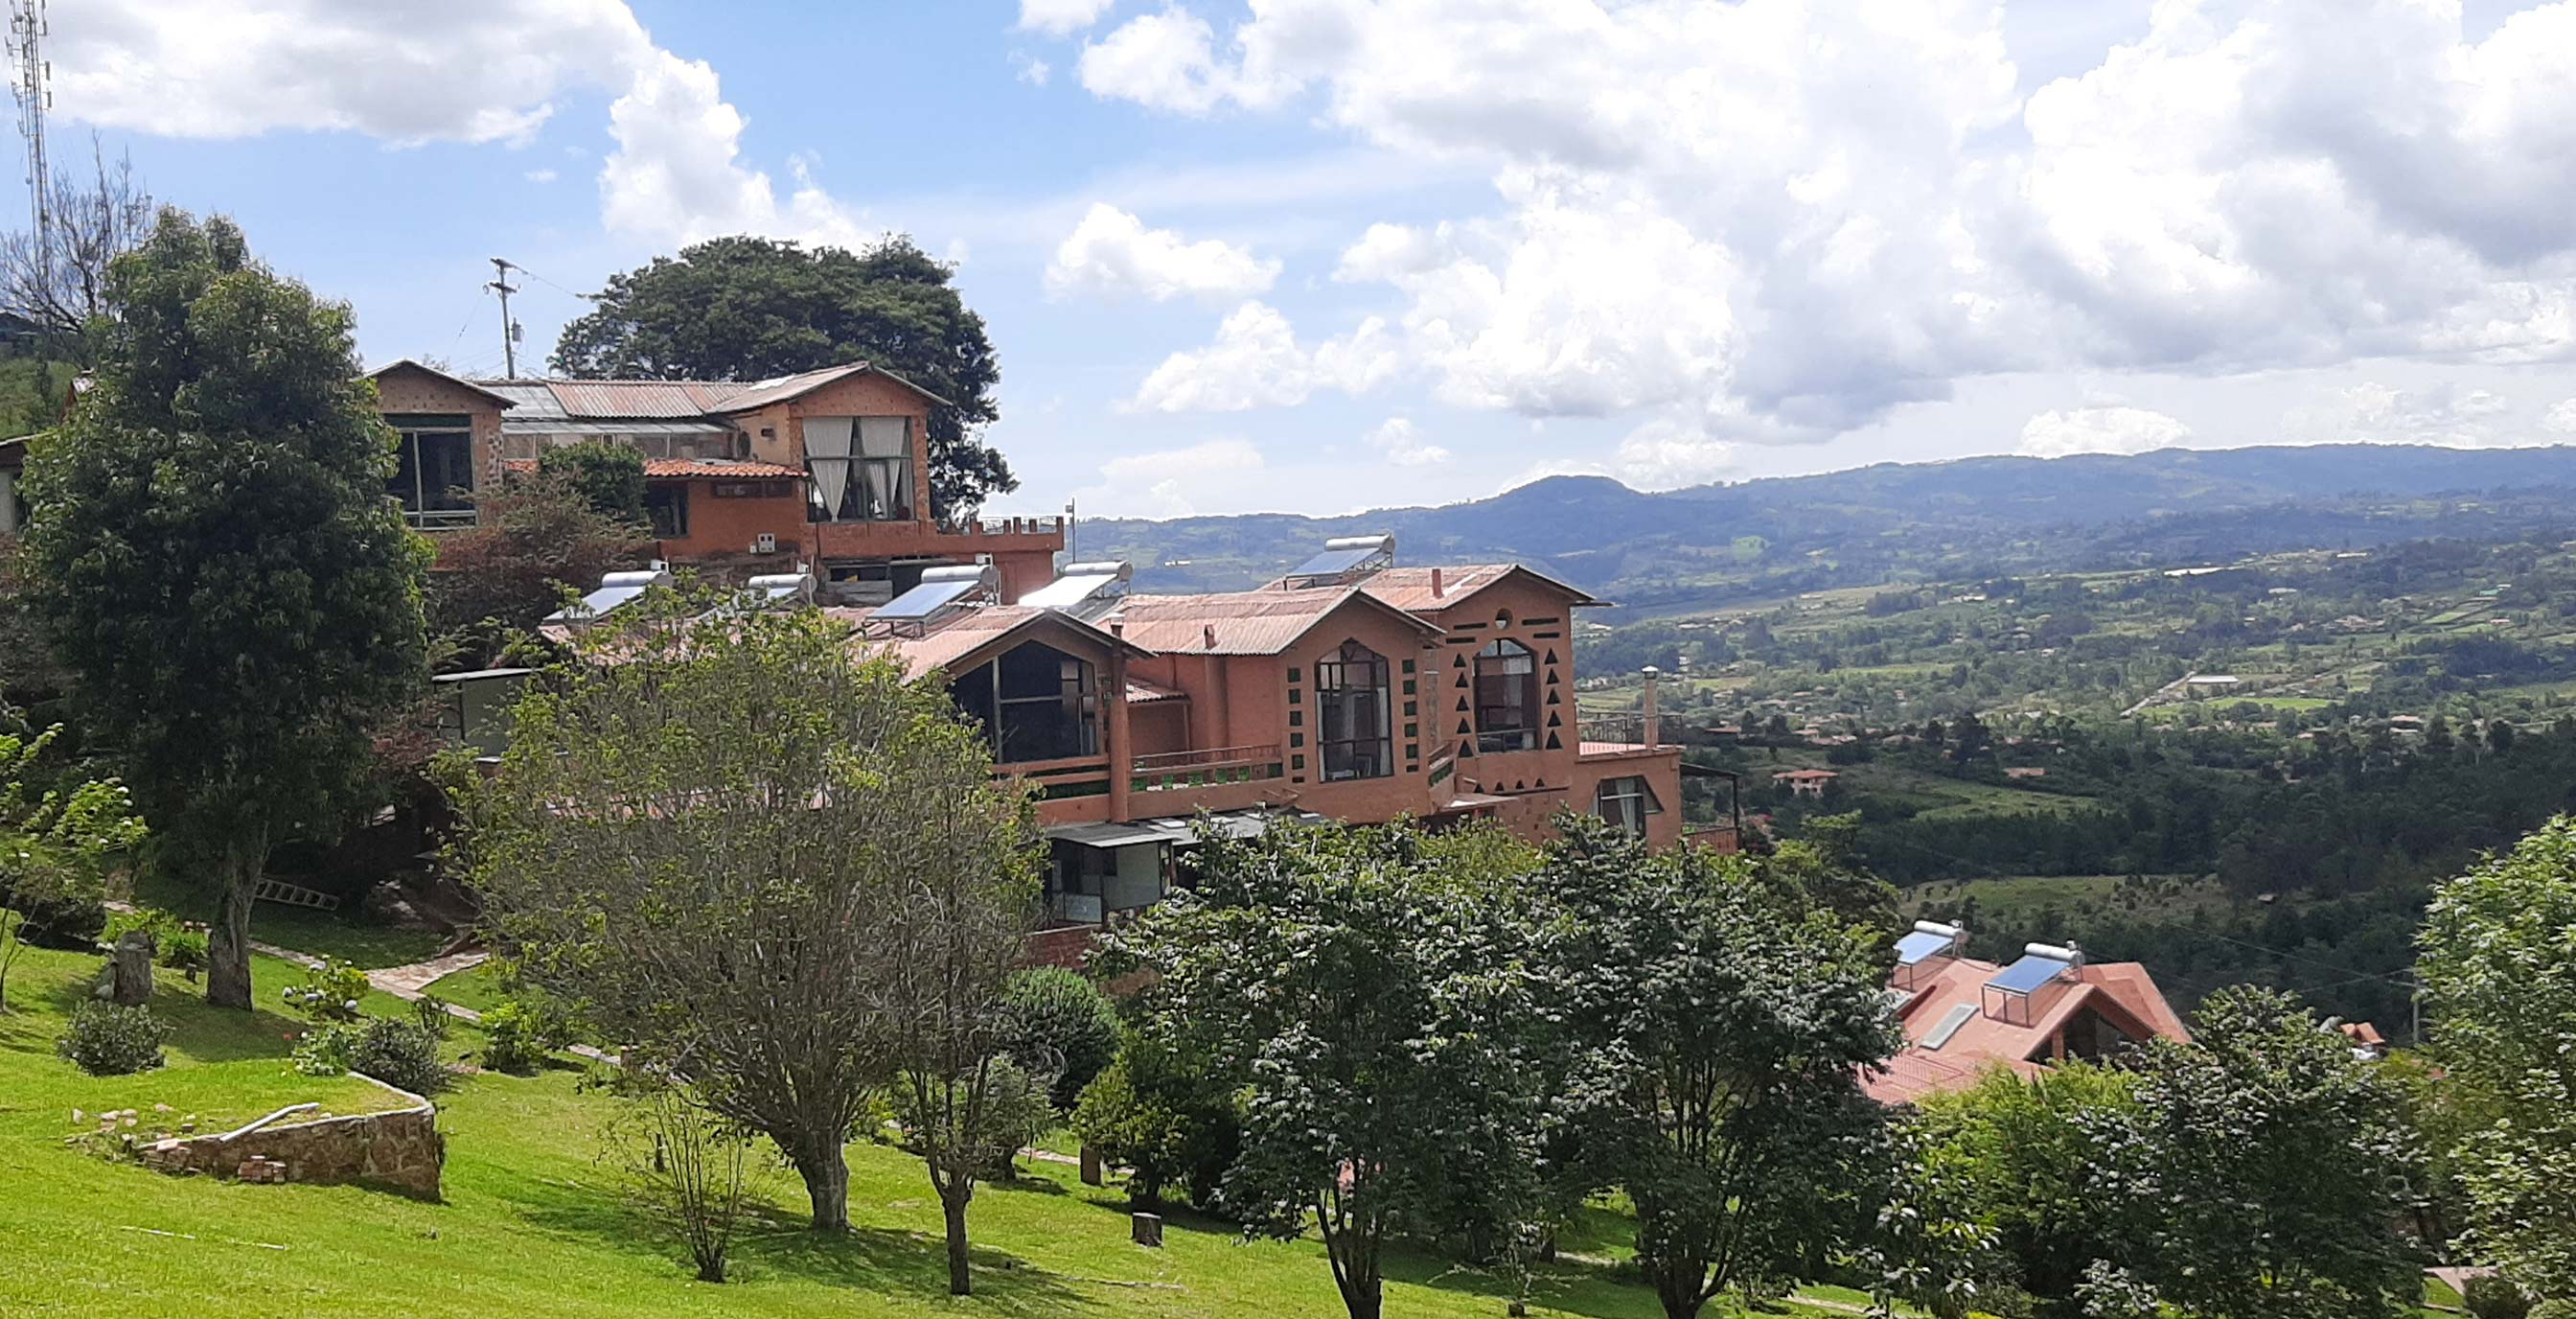 Hoteles Villa de Leyva descuentos